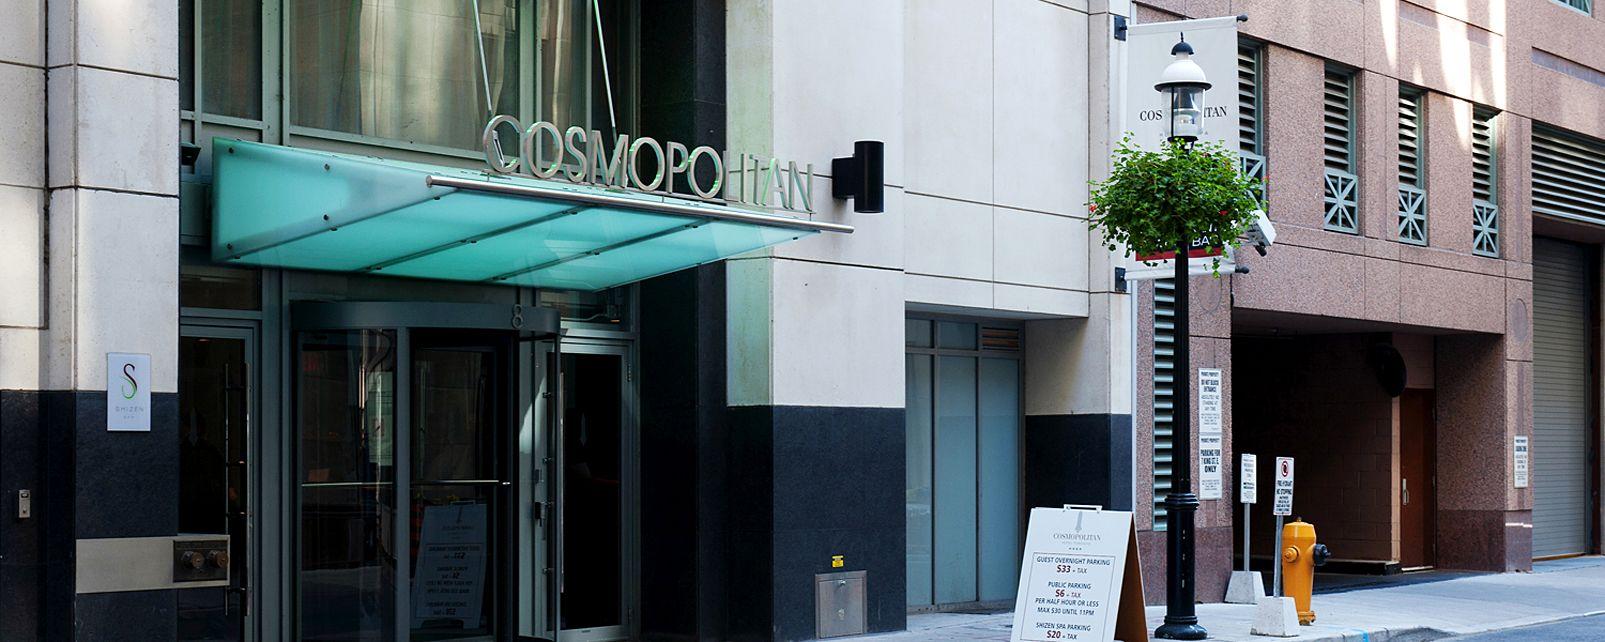 Hotel Cosmopolitan Toronto Hotel and Spa